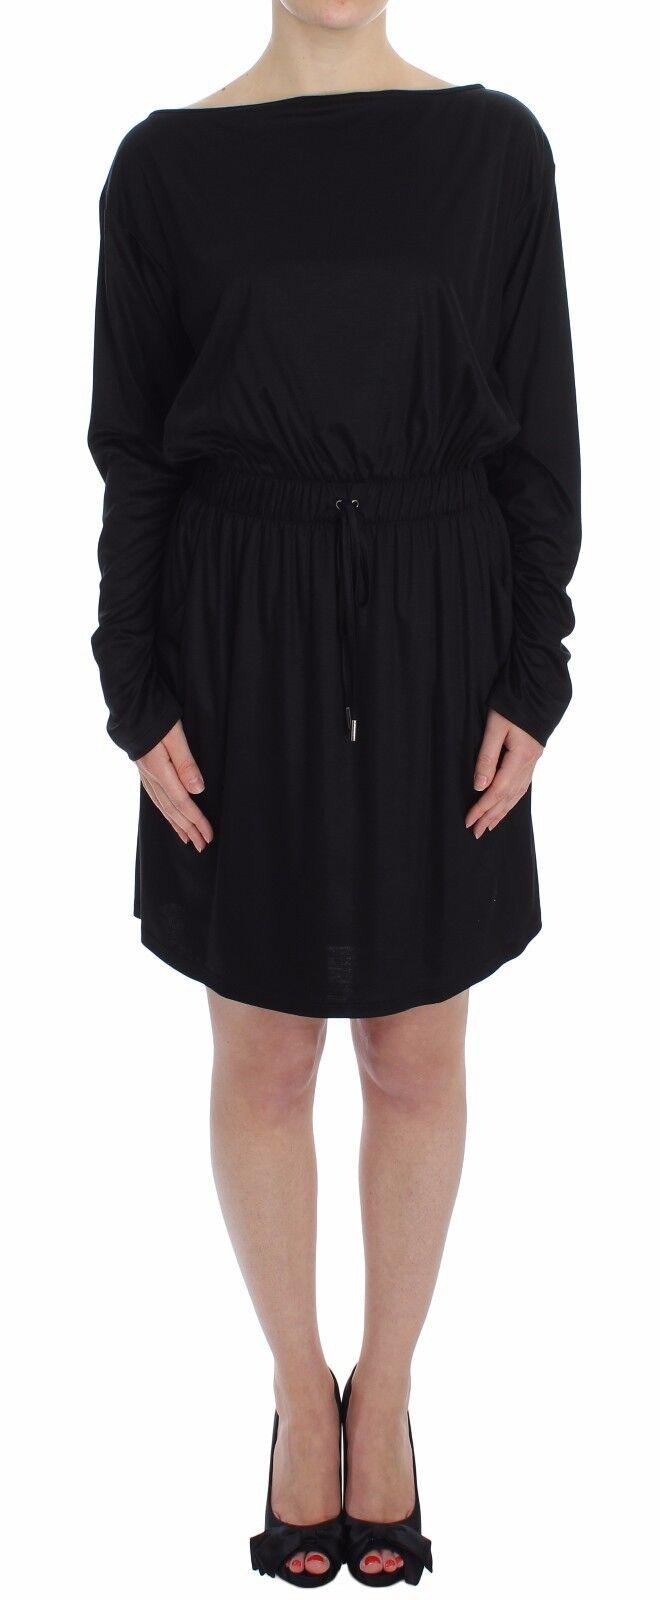 NWT  VERSACE JEANS COUTURE VJC schwarz Modal Silk Shift Knee Dress IT40   S